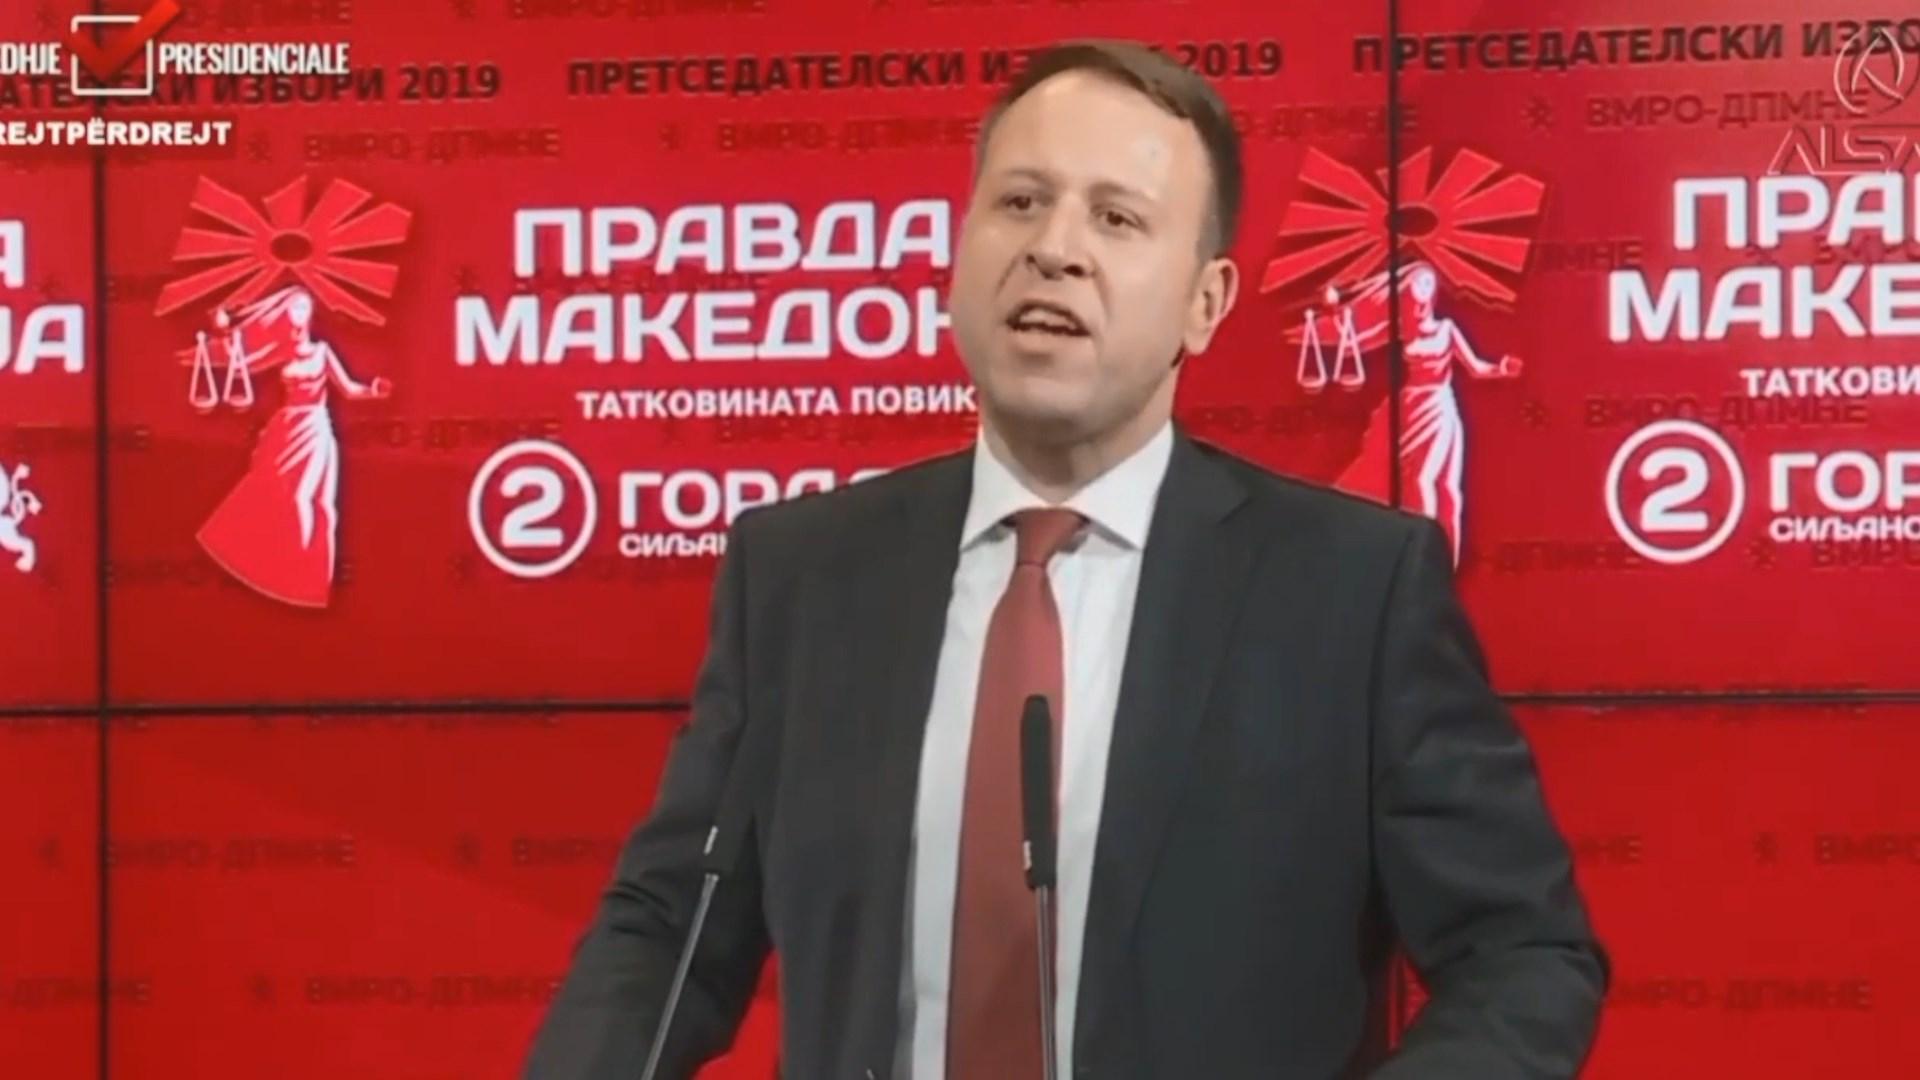 VMRO-DPMNE shpall fitoren: Siljanovska fitoi e vetme përballë LSDM e BDI